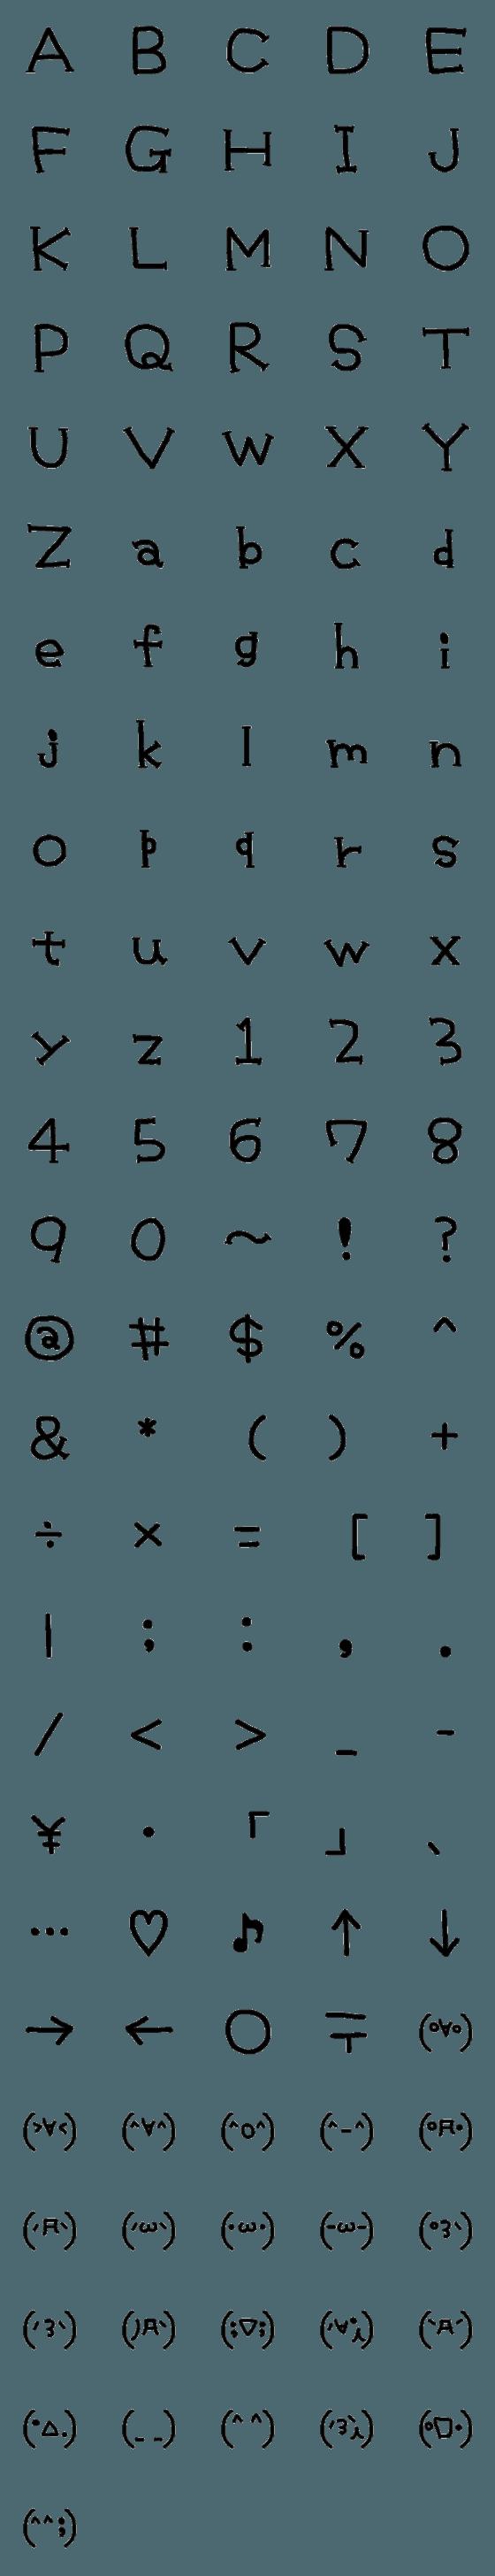 数字 可愛い 特殊文字